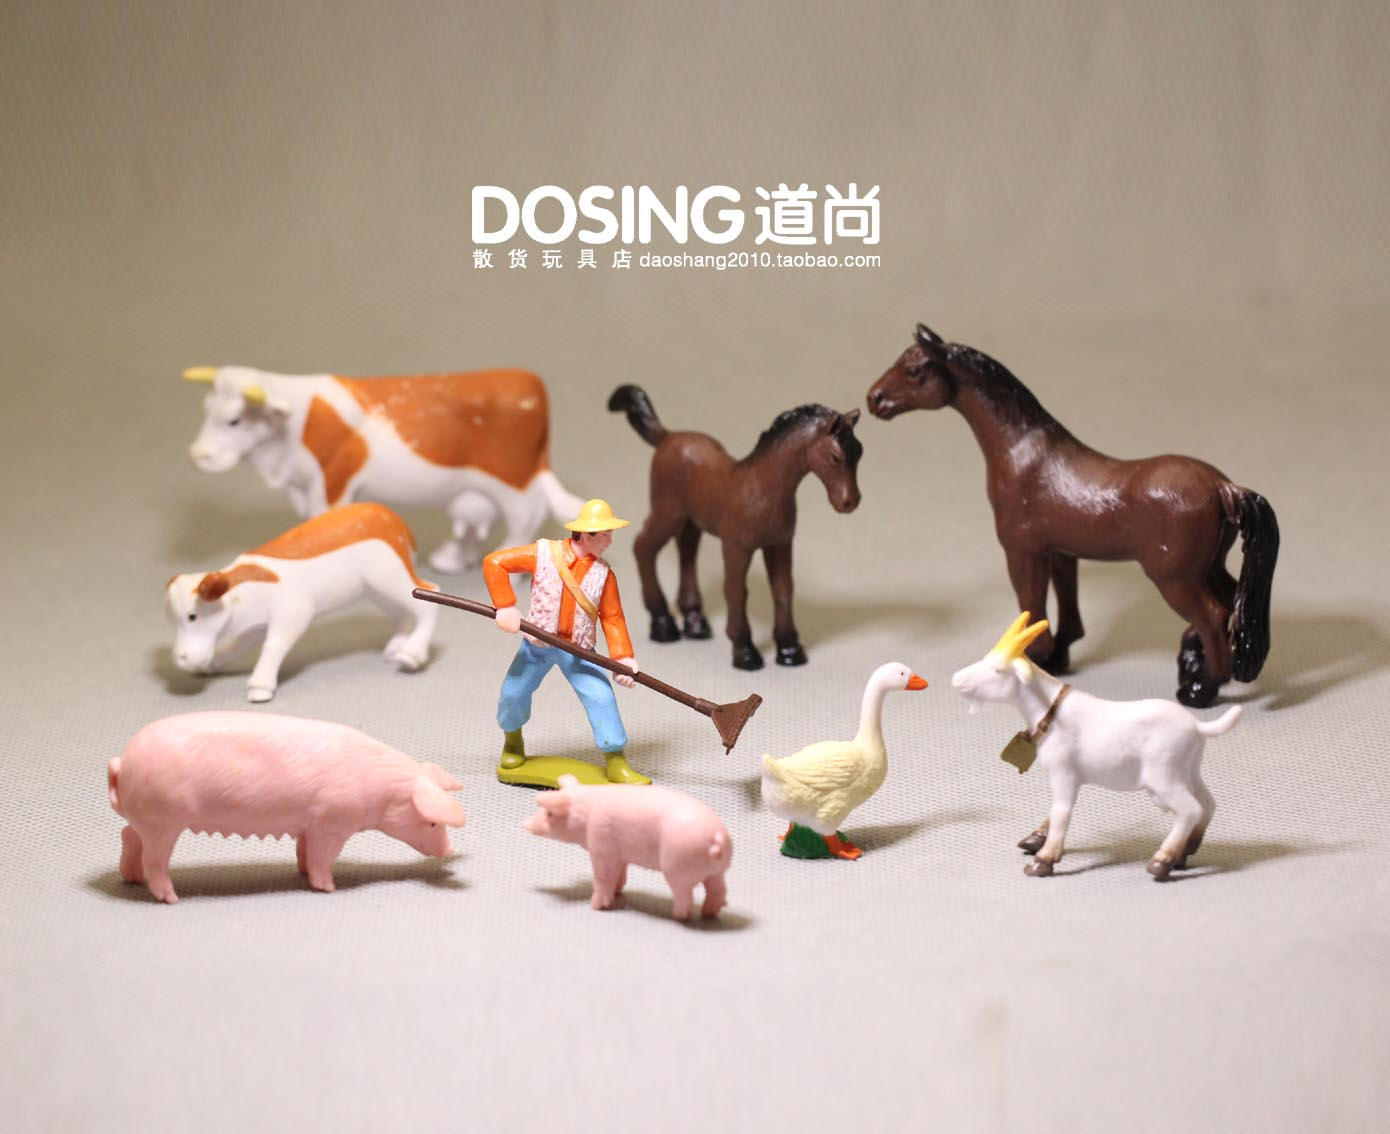 Black Sheep Farm Animal Model Figure Figurine Kids Toy Gift Home Decor